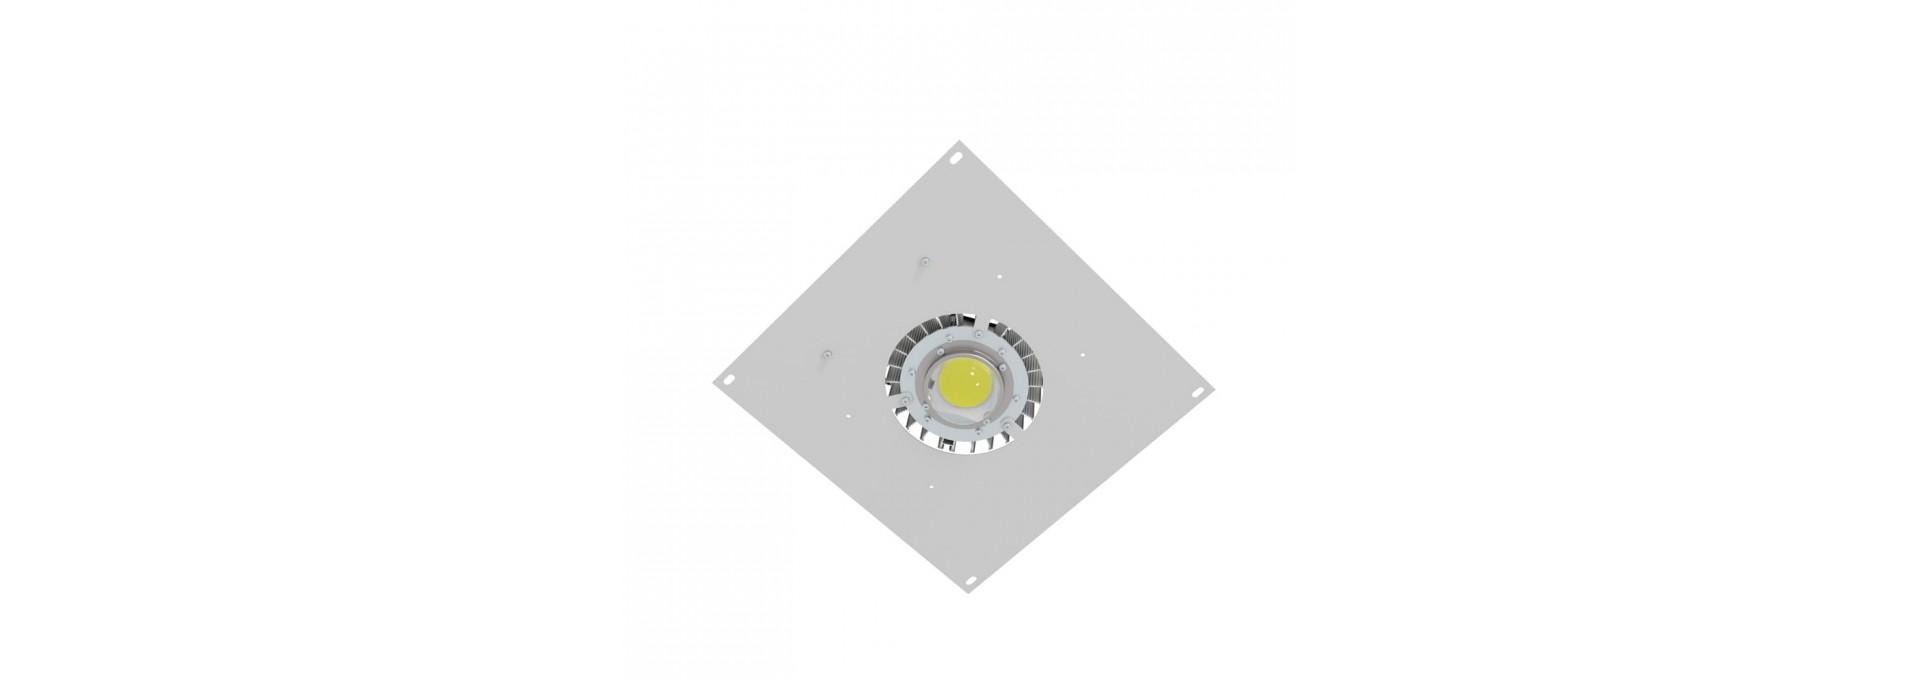 АЗС 50 Экстра 6500К 60°